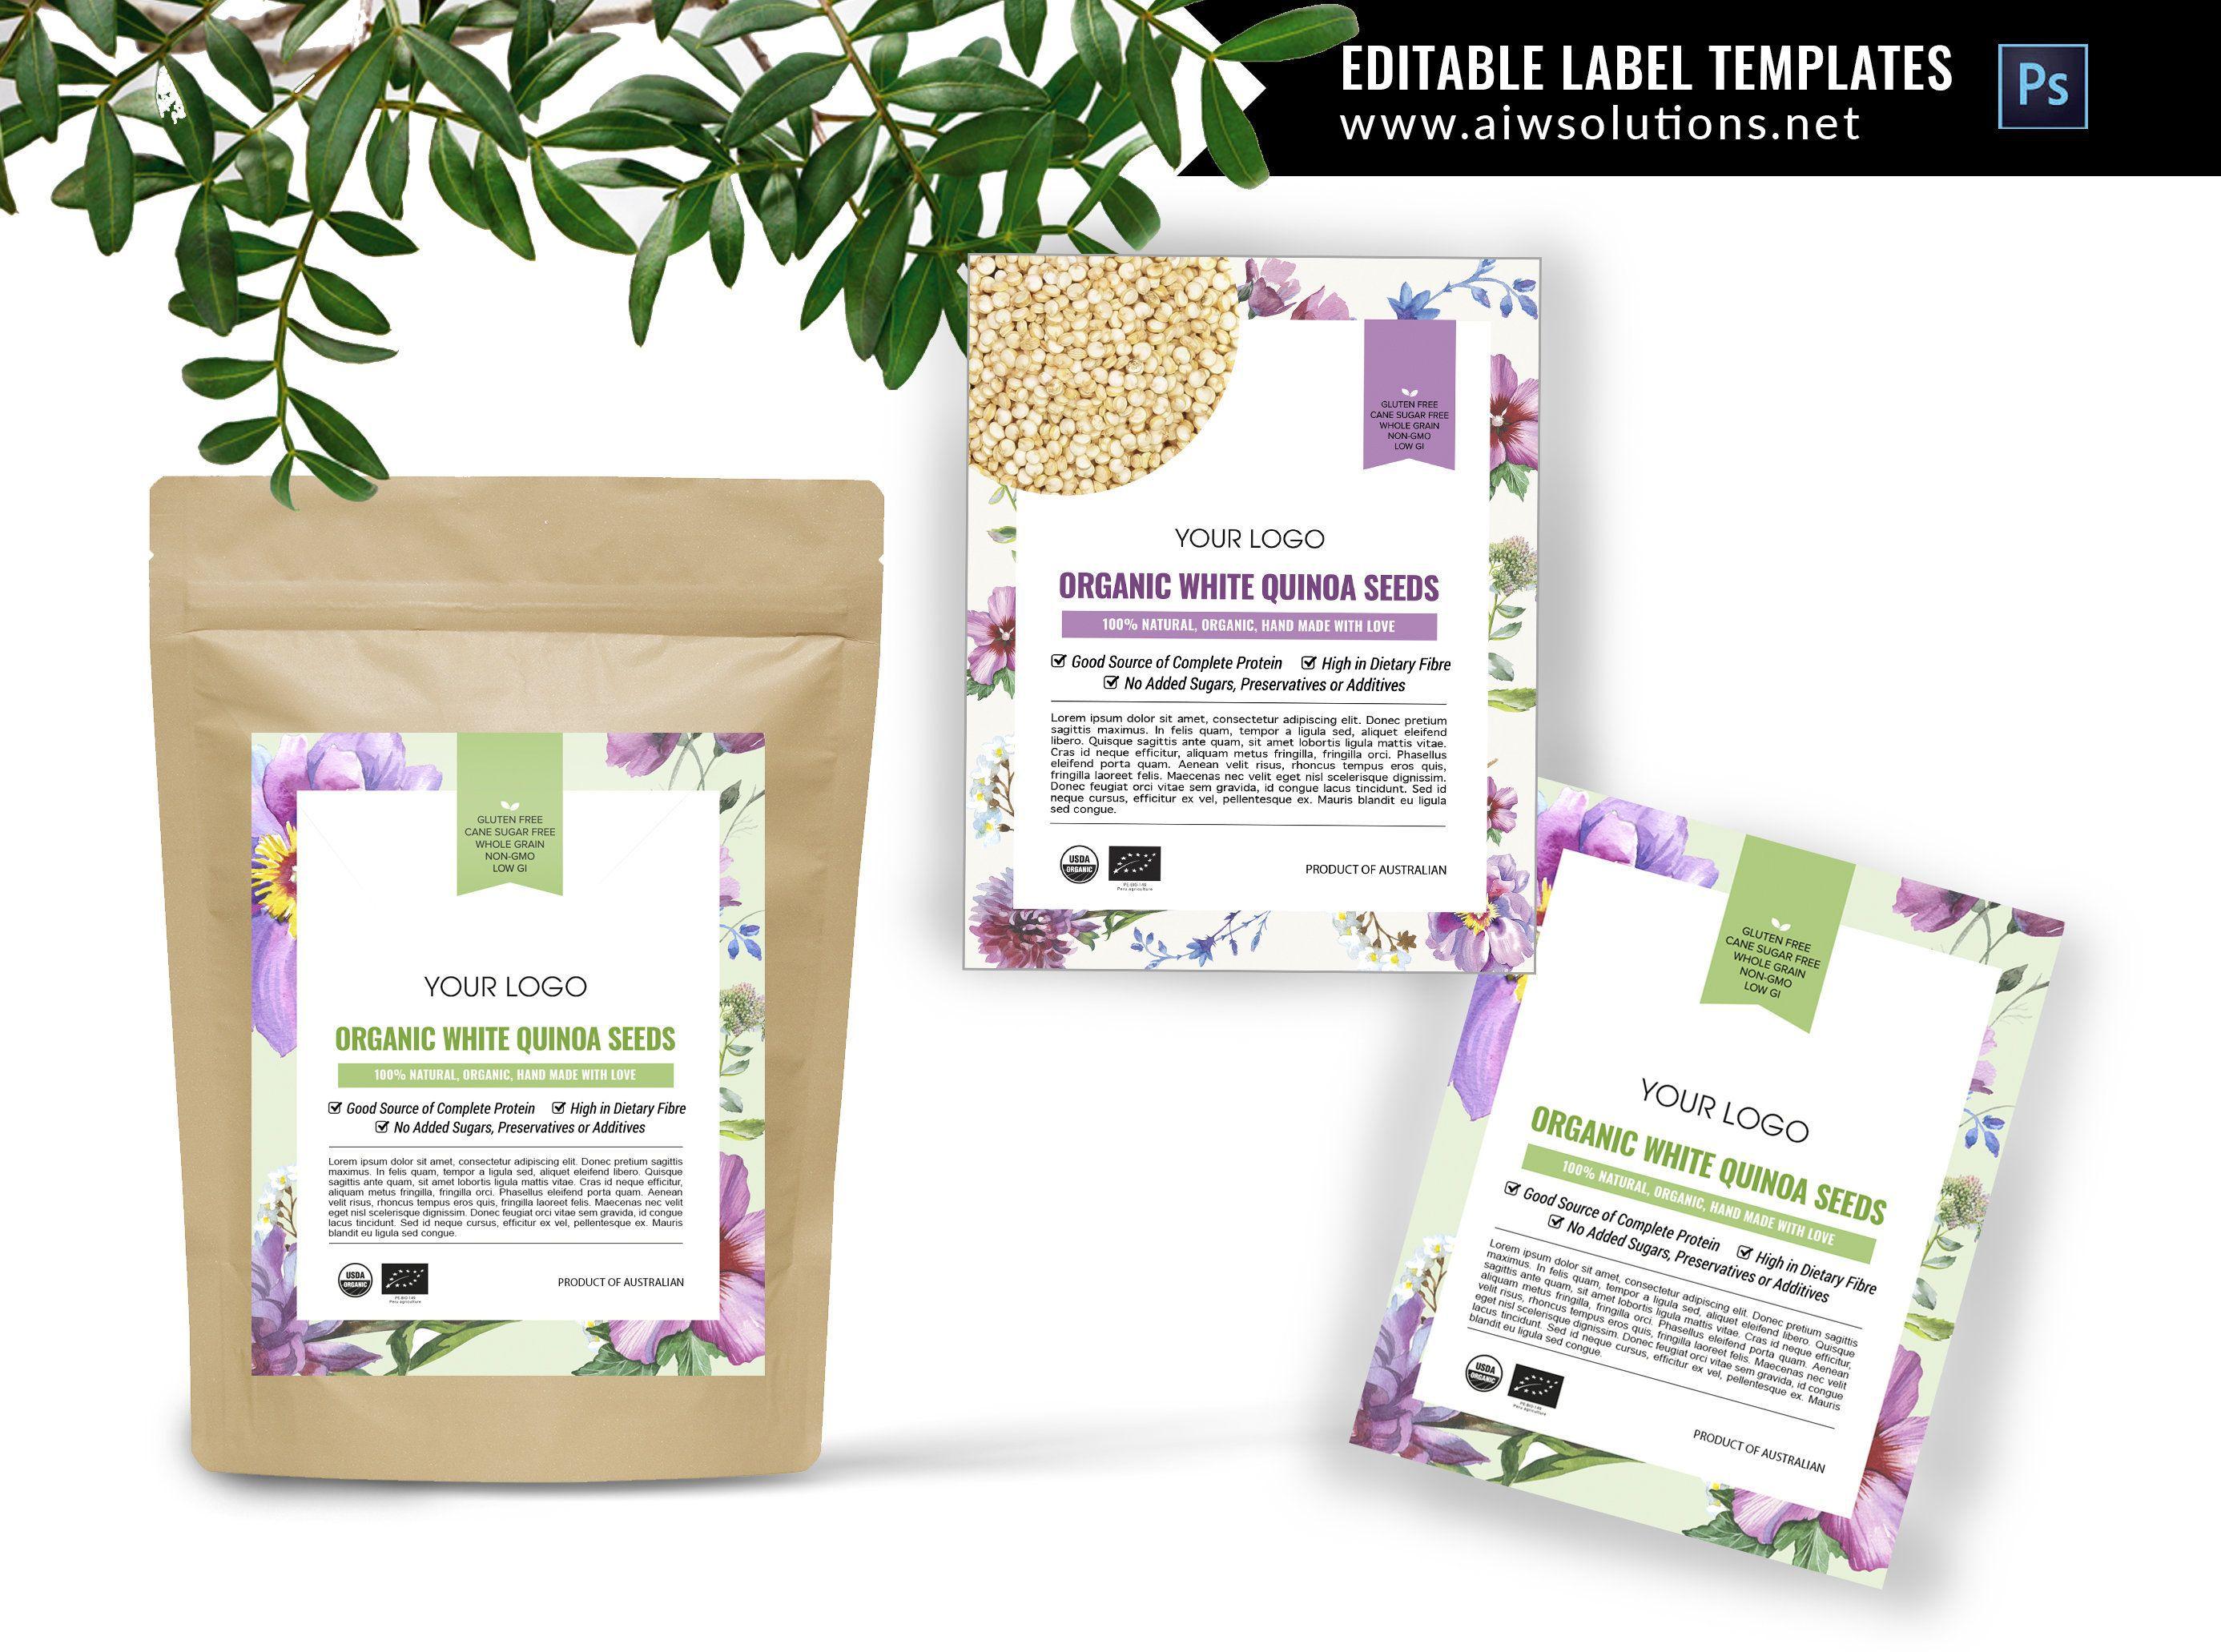 000 Stupendou Free Food Label Design Template Inspiration  Templates DownloadFull